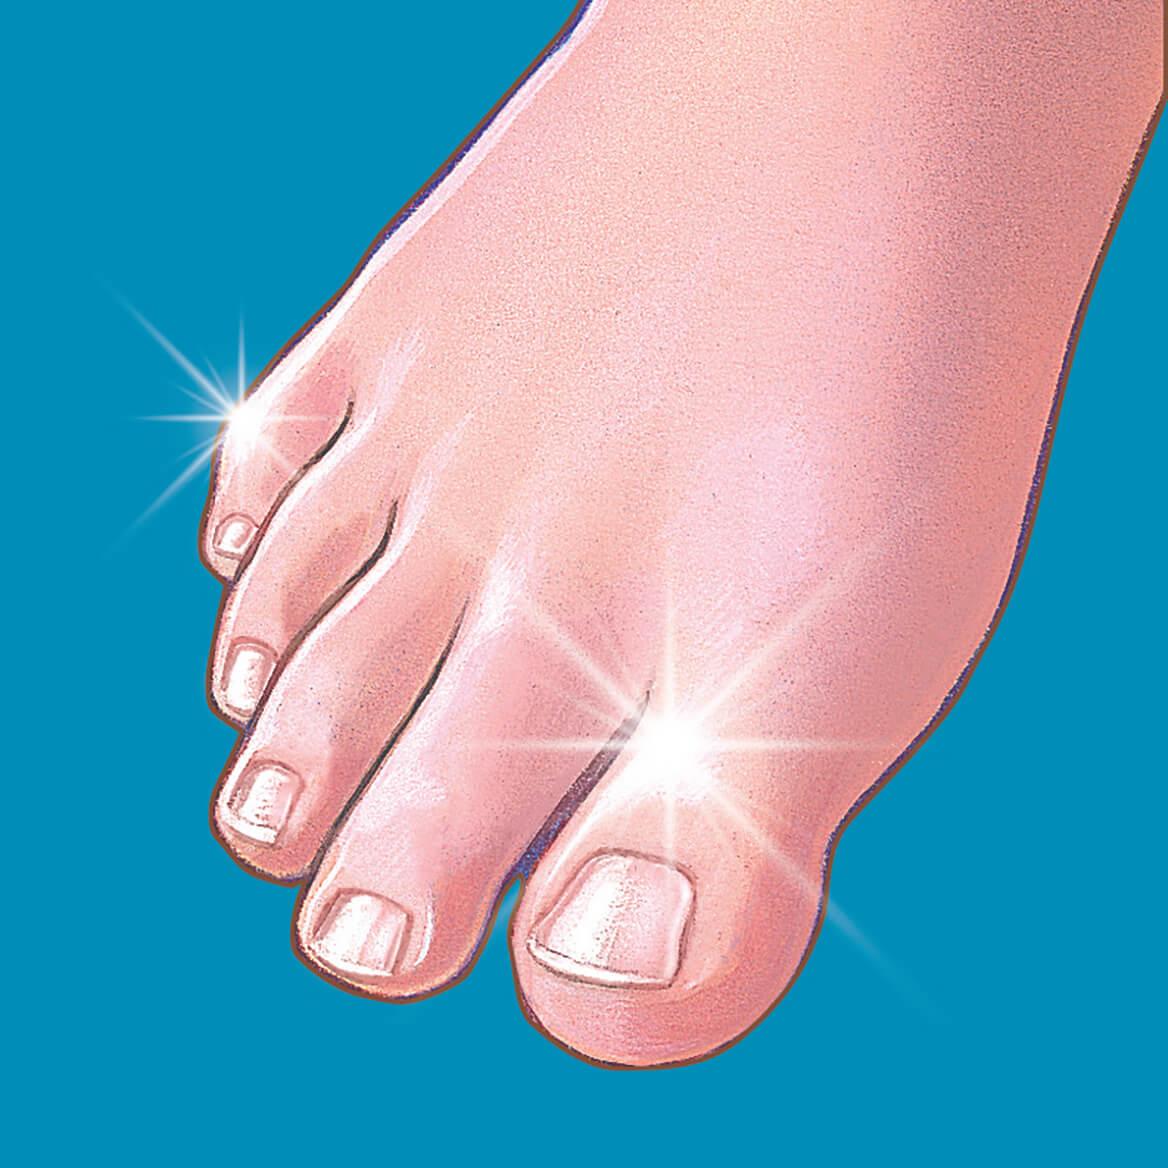 Antifungal Nail Treatment 1oz-370041